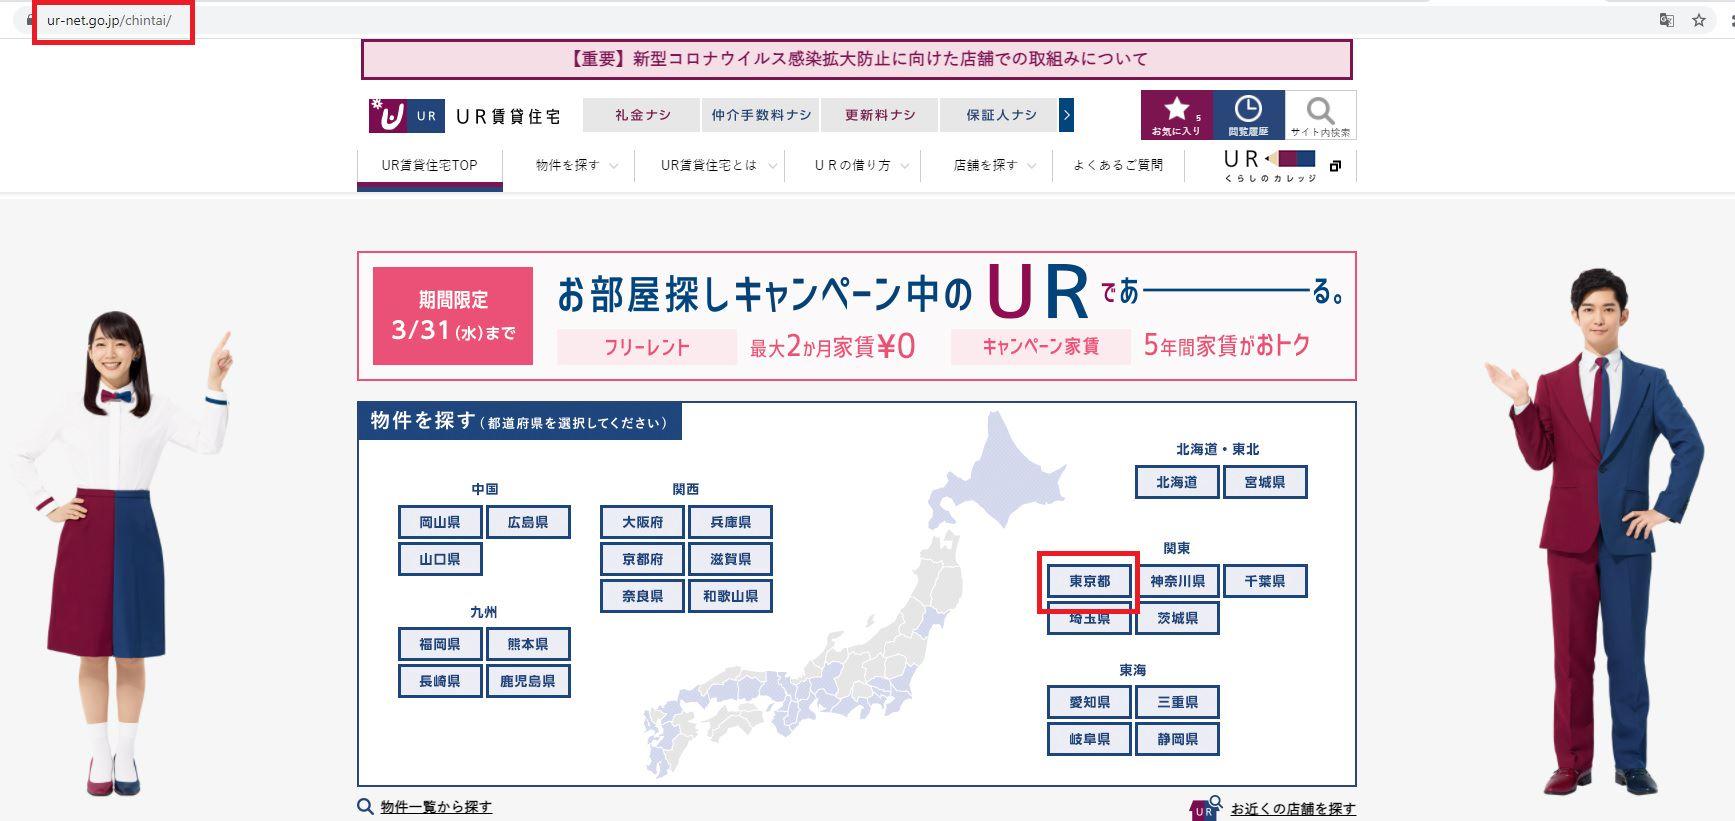 Inquiries about UR rental housing (UR賃貸住宅のお問い合わせ) Step 1